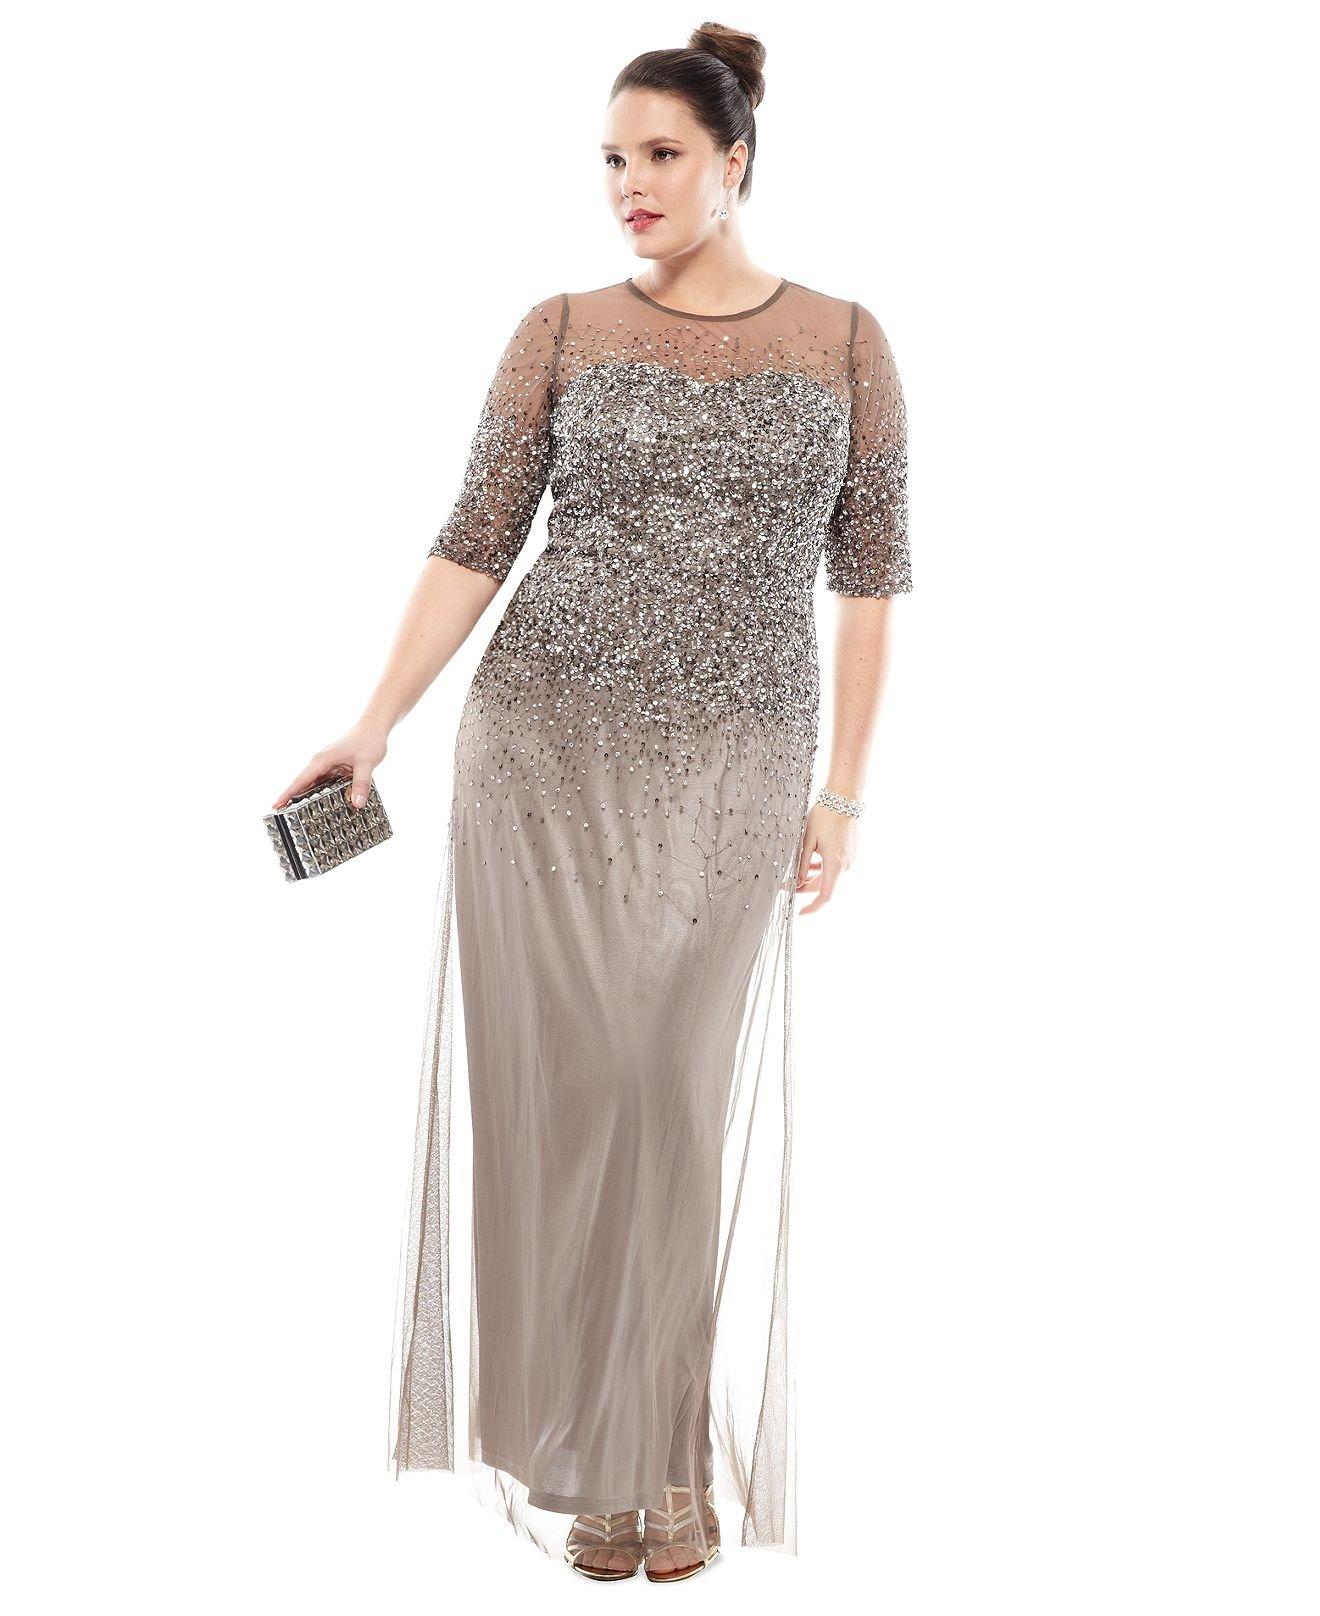 homecoming dresses macys photo - 1